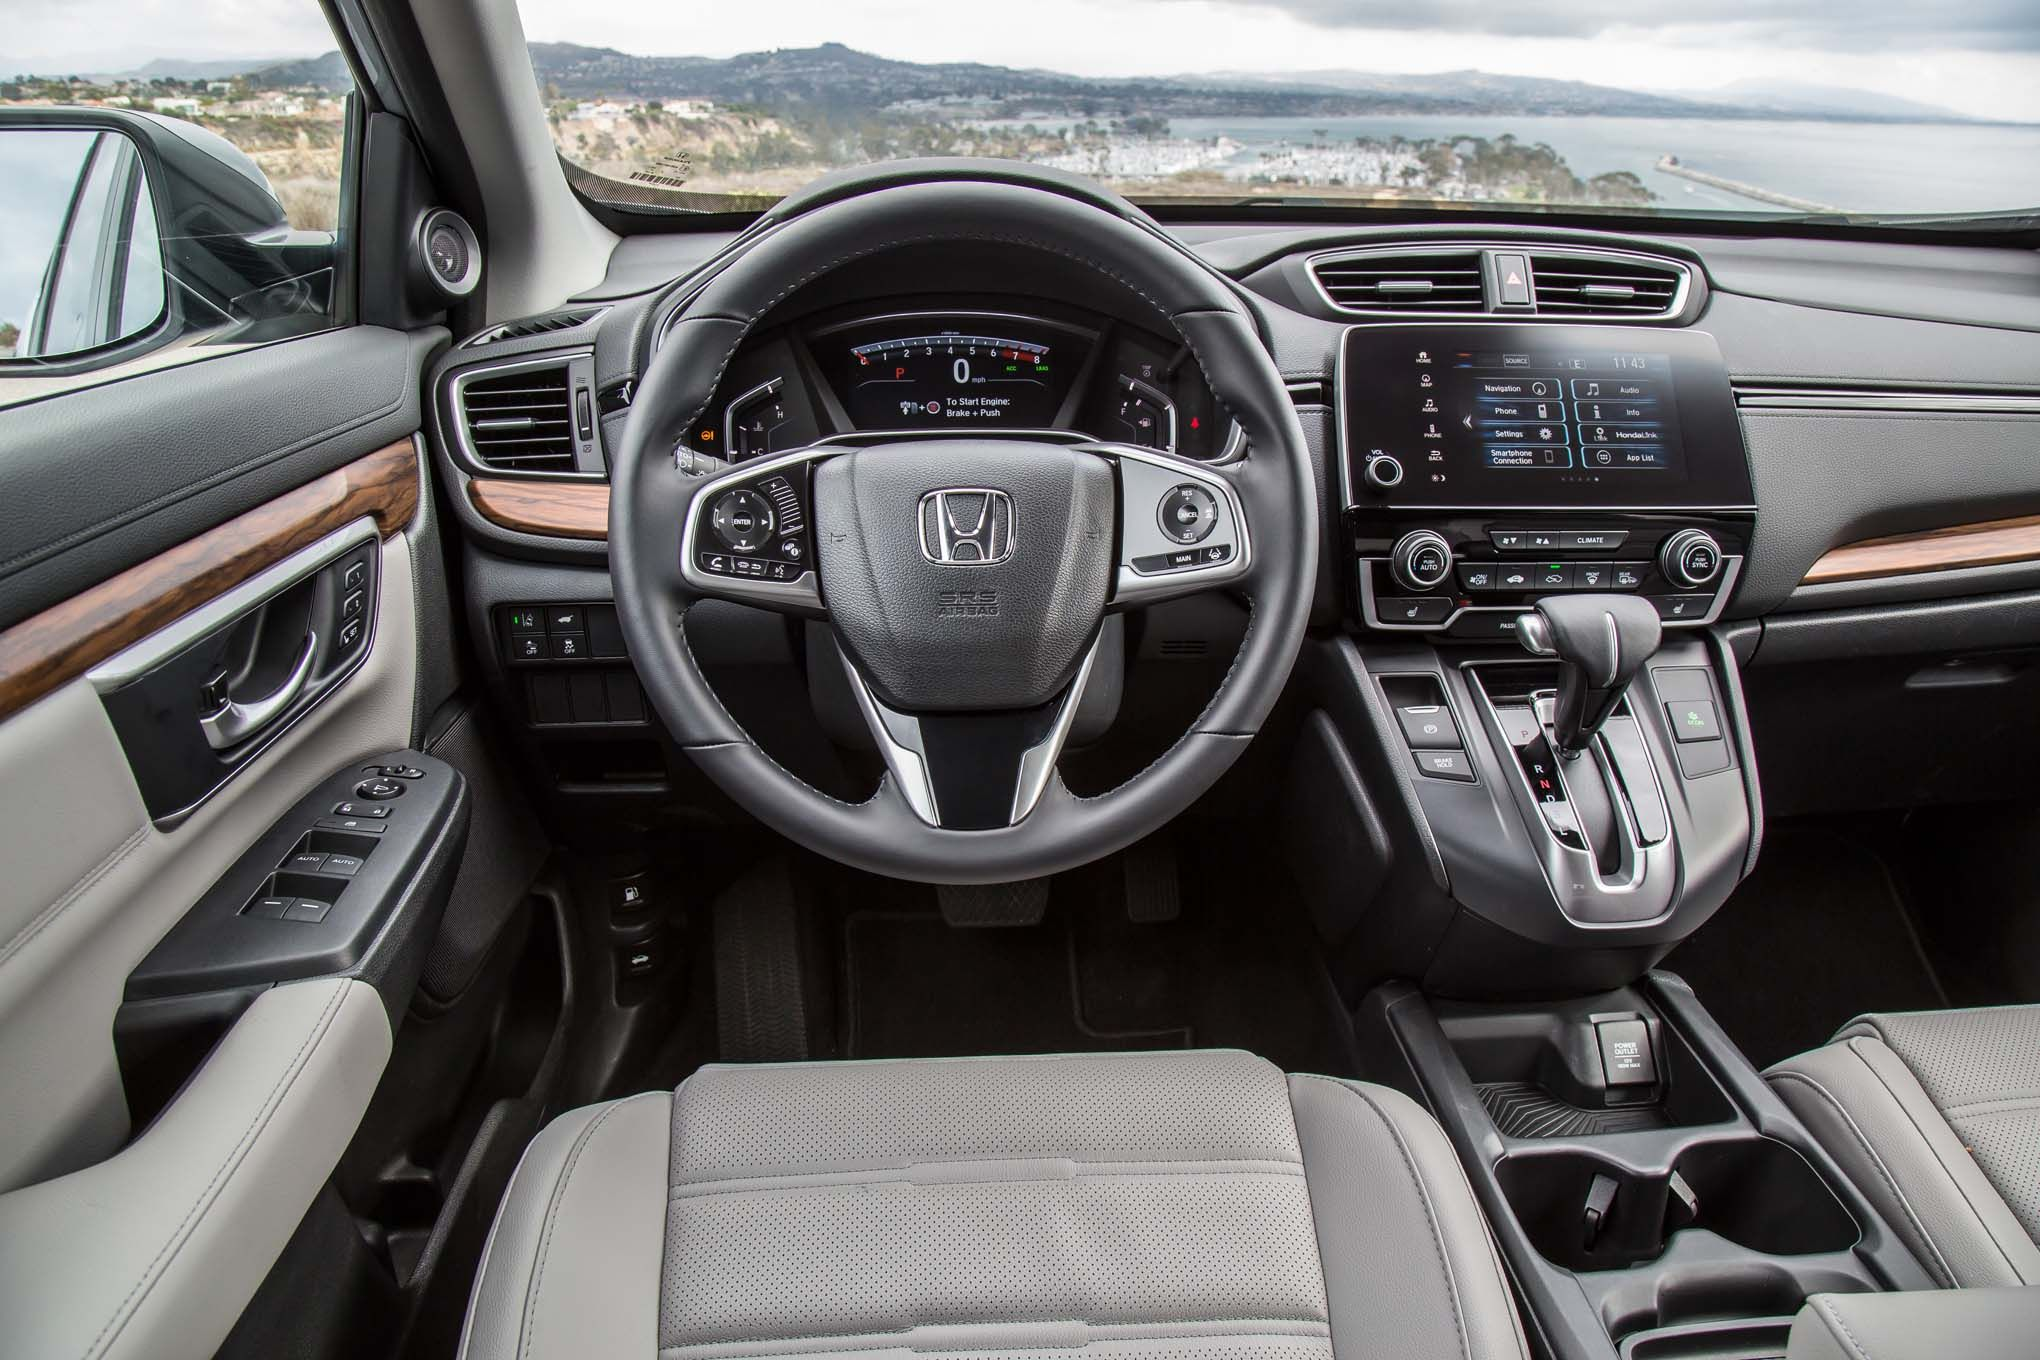 http://st.motortrend.com/uploads/sites/5/2016/11/2017-Honda-CR-V-Touring-AWD-cockpit.jpg